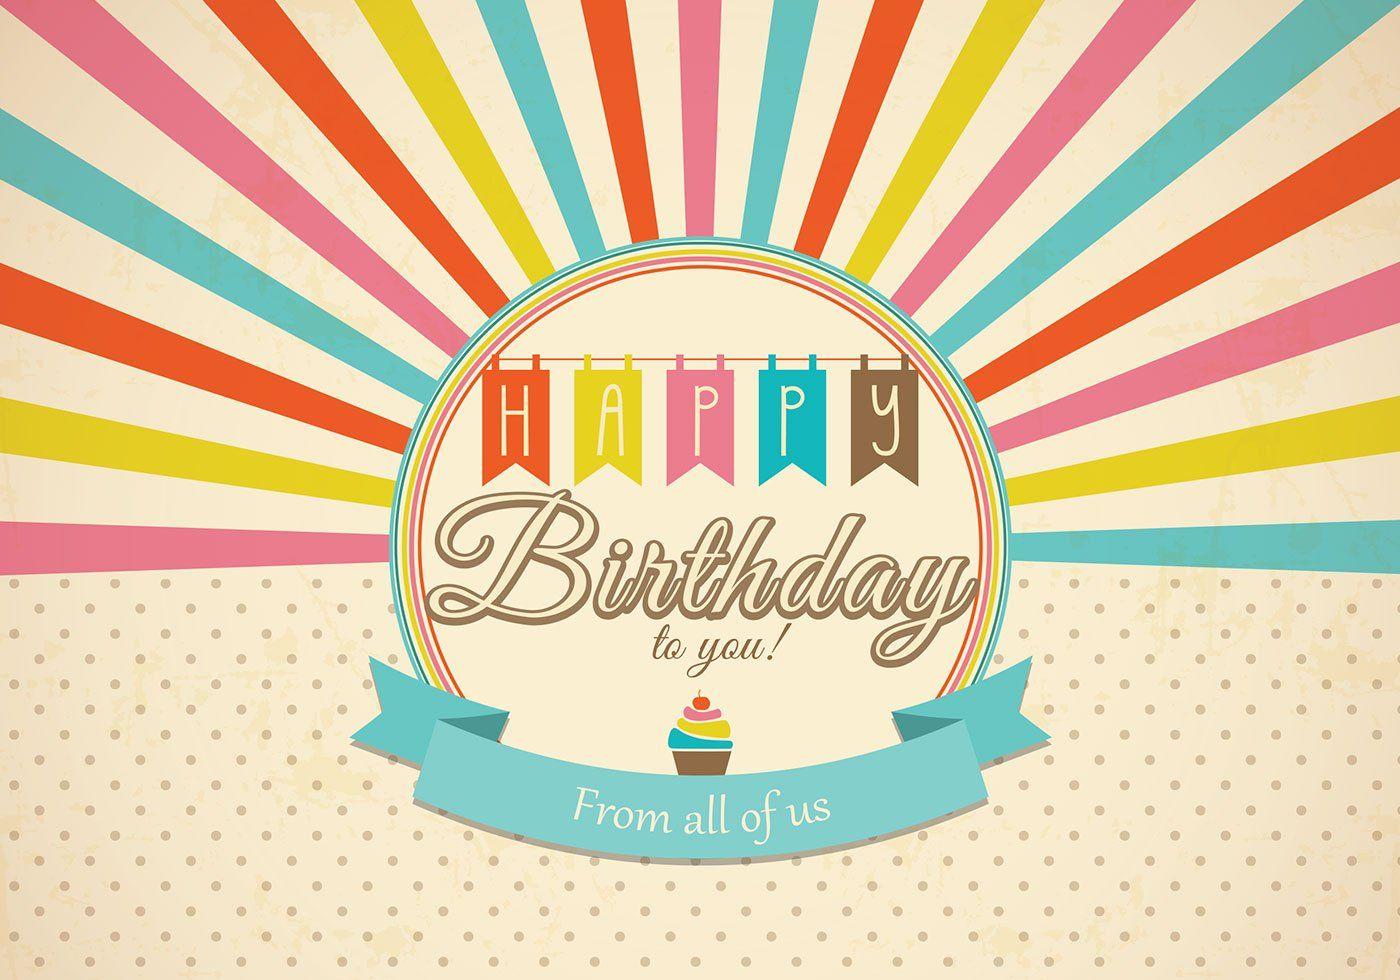 Retro Happy Birthday Card Psd Free Brushes At